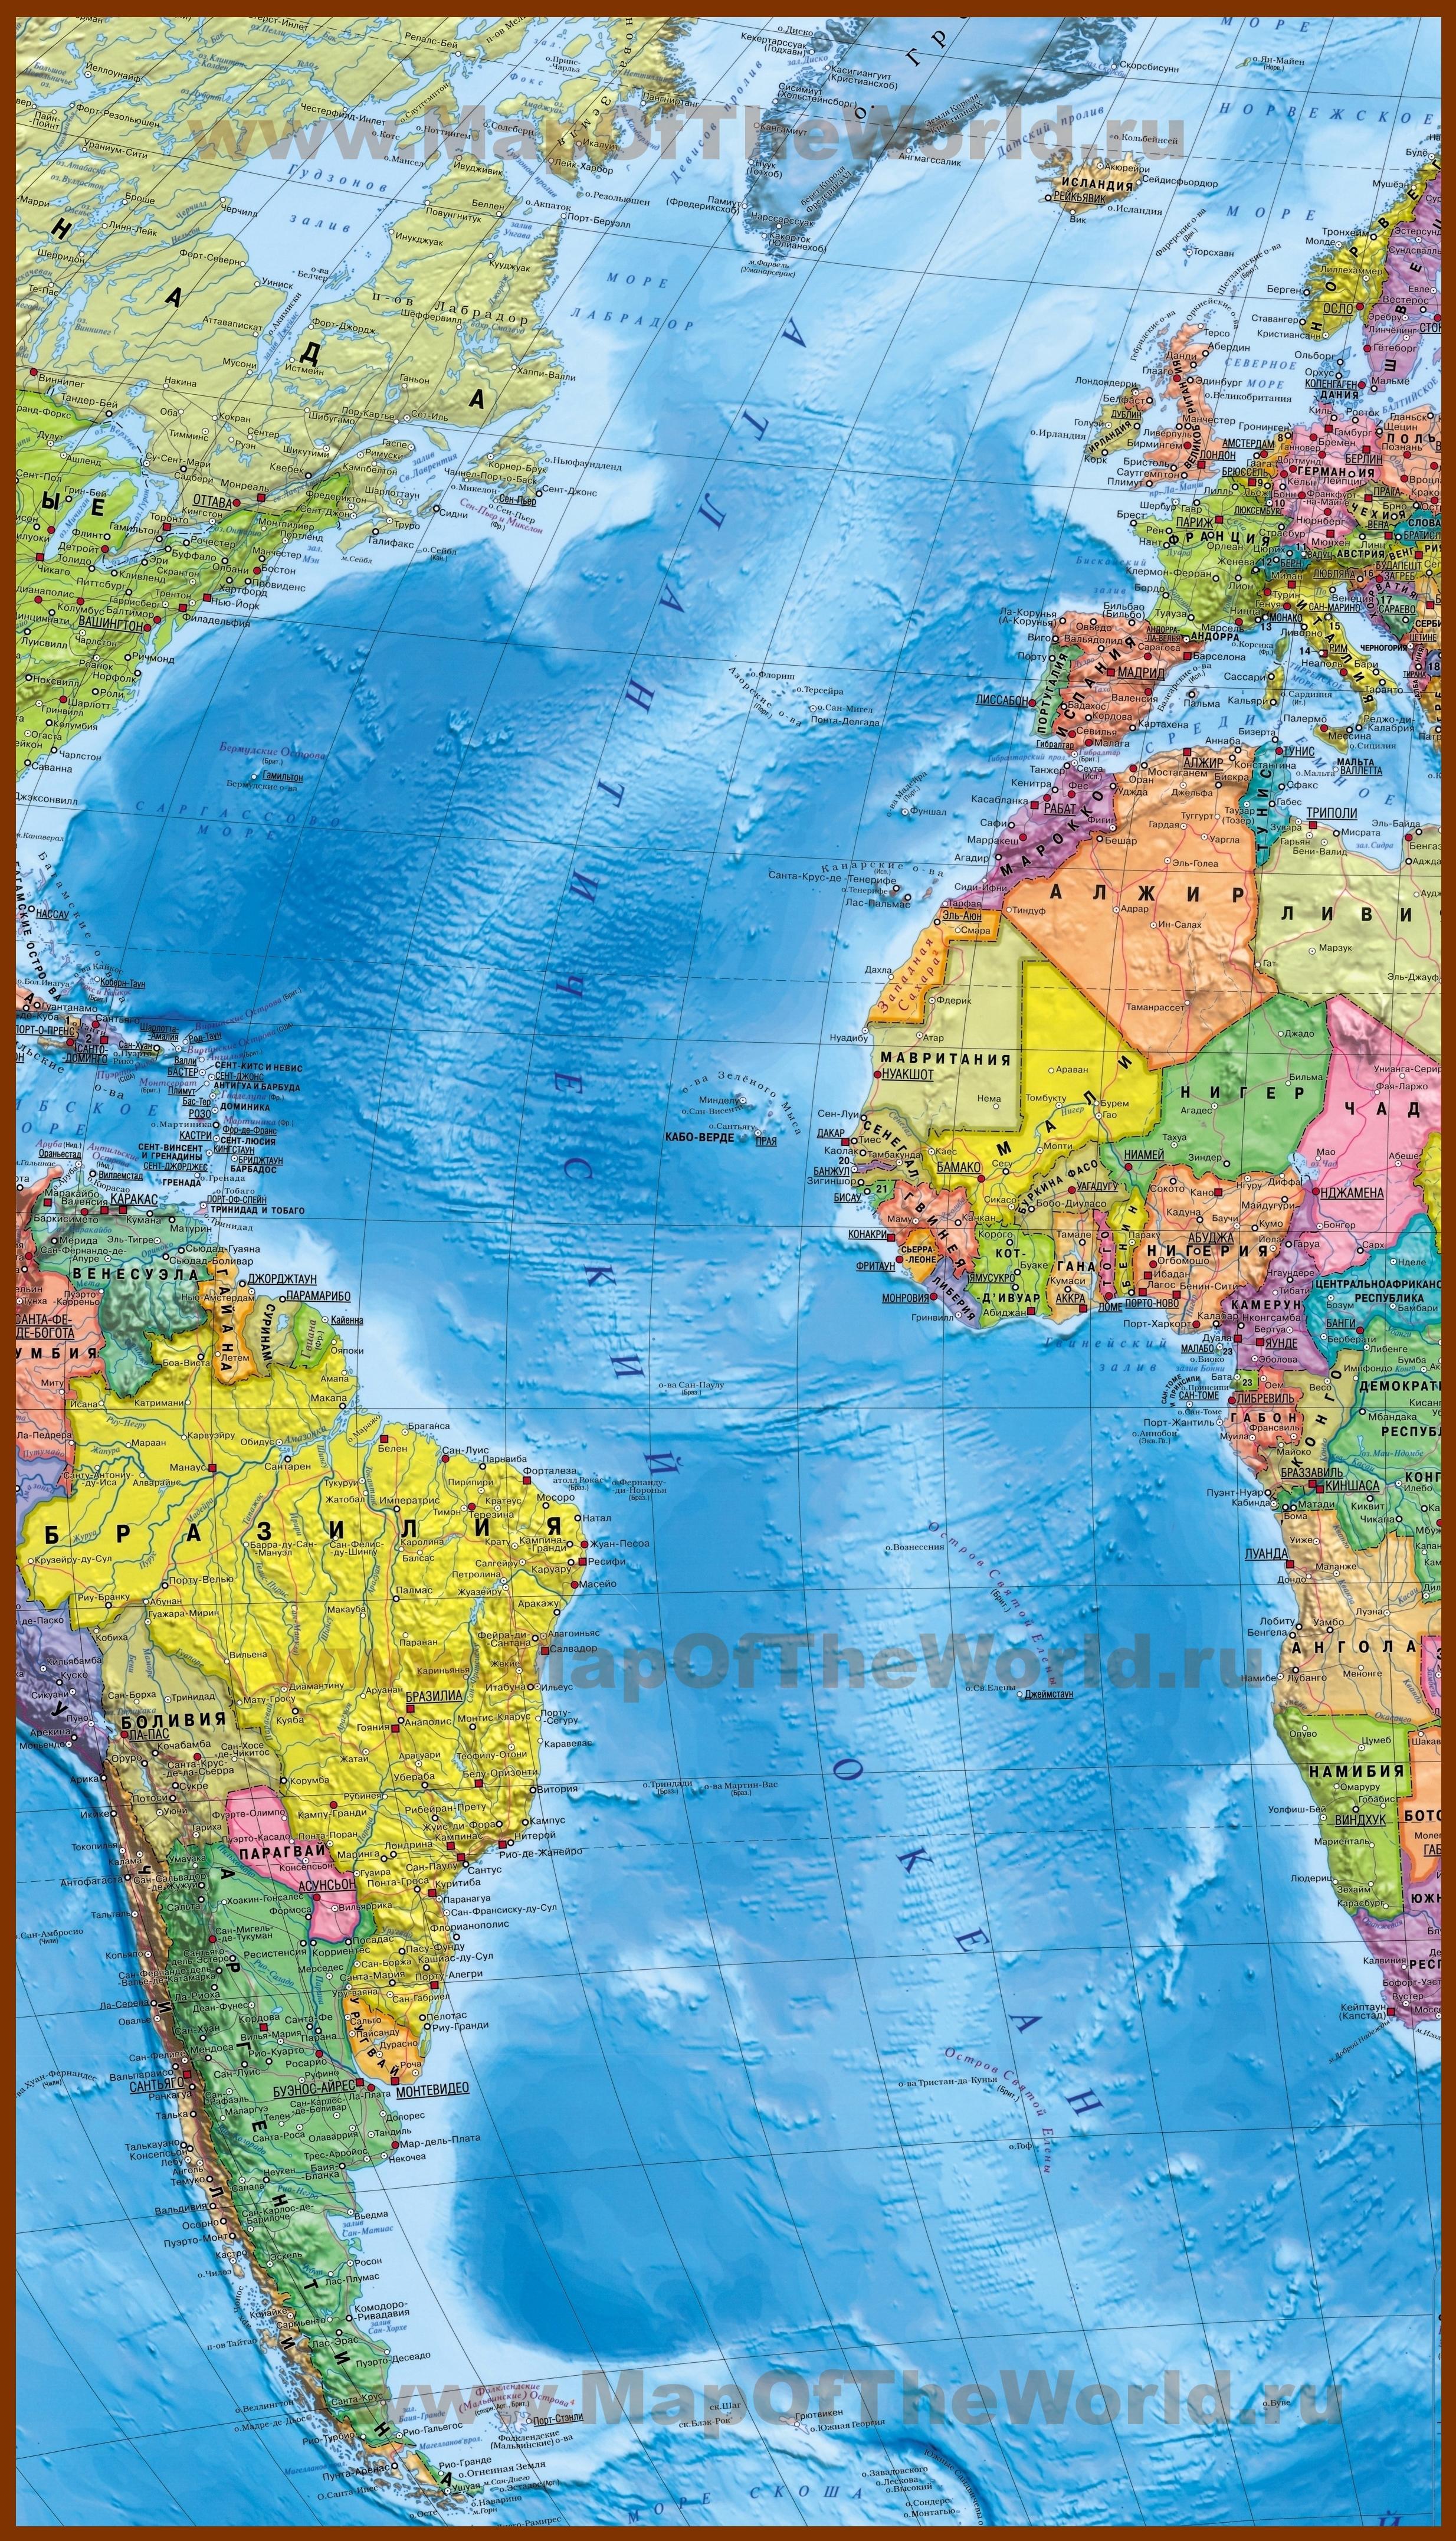 атлантический океан на карте россии фото